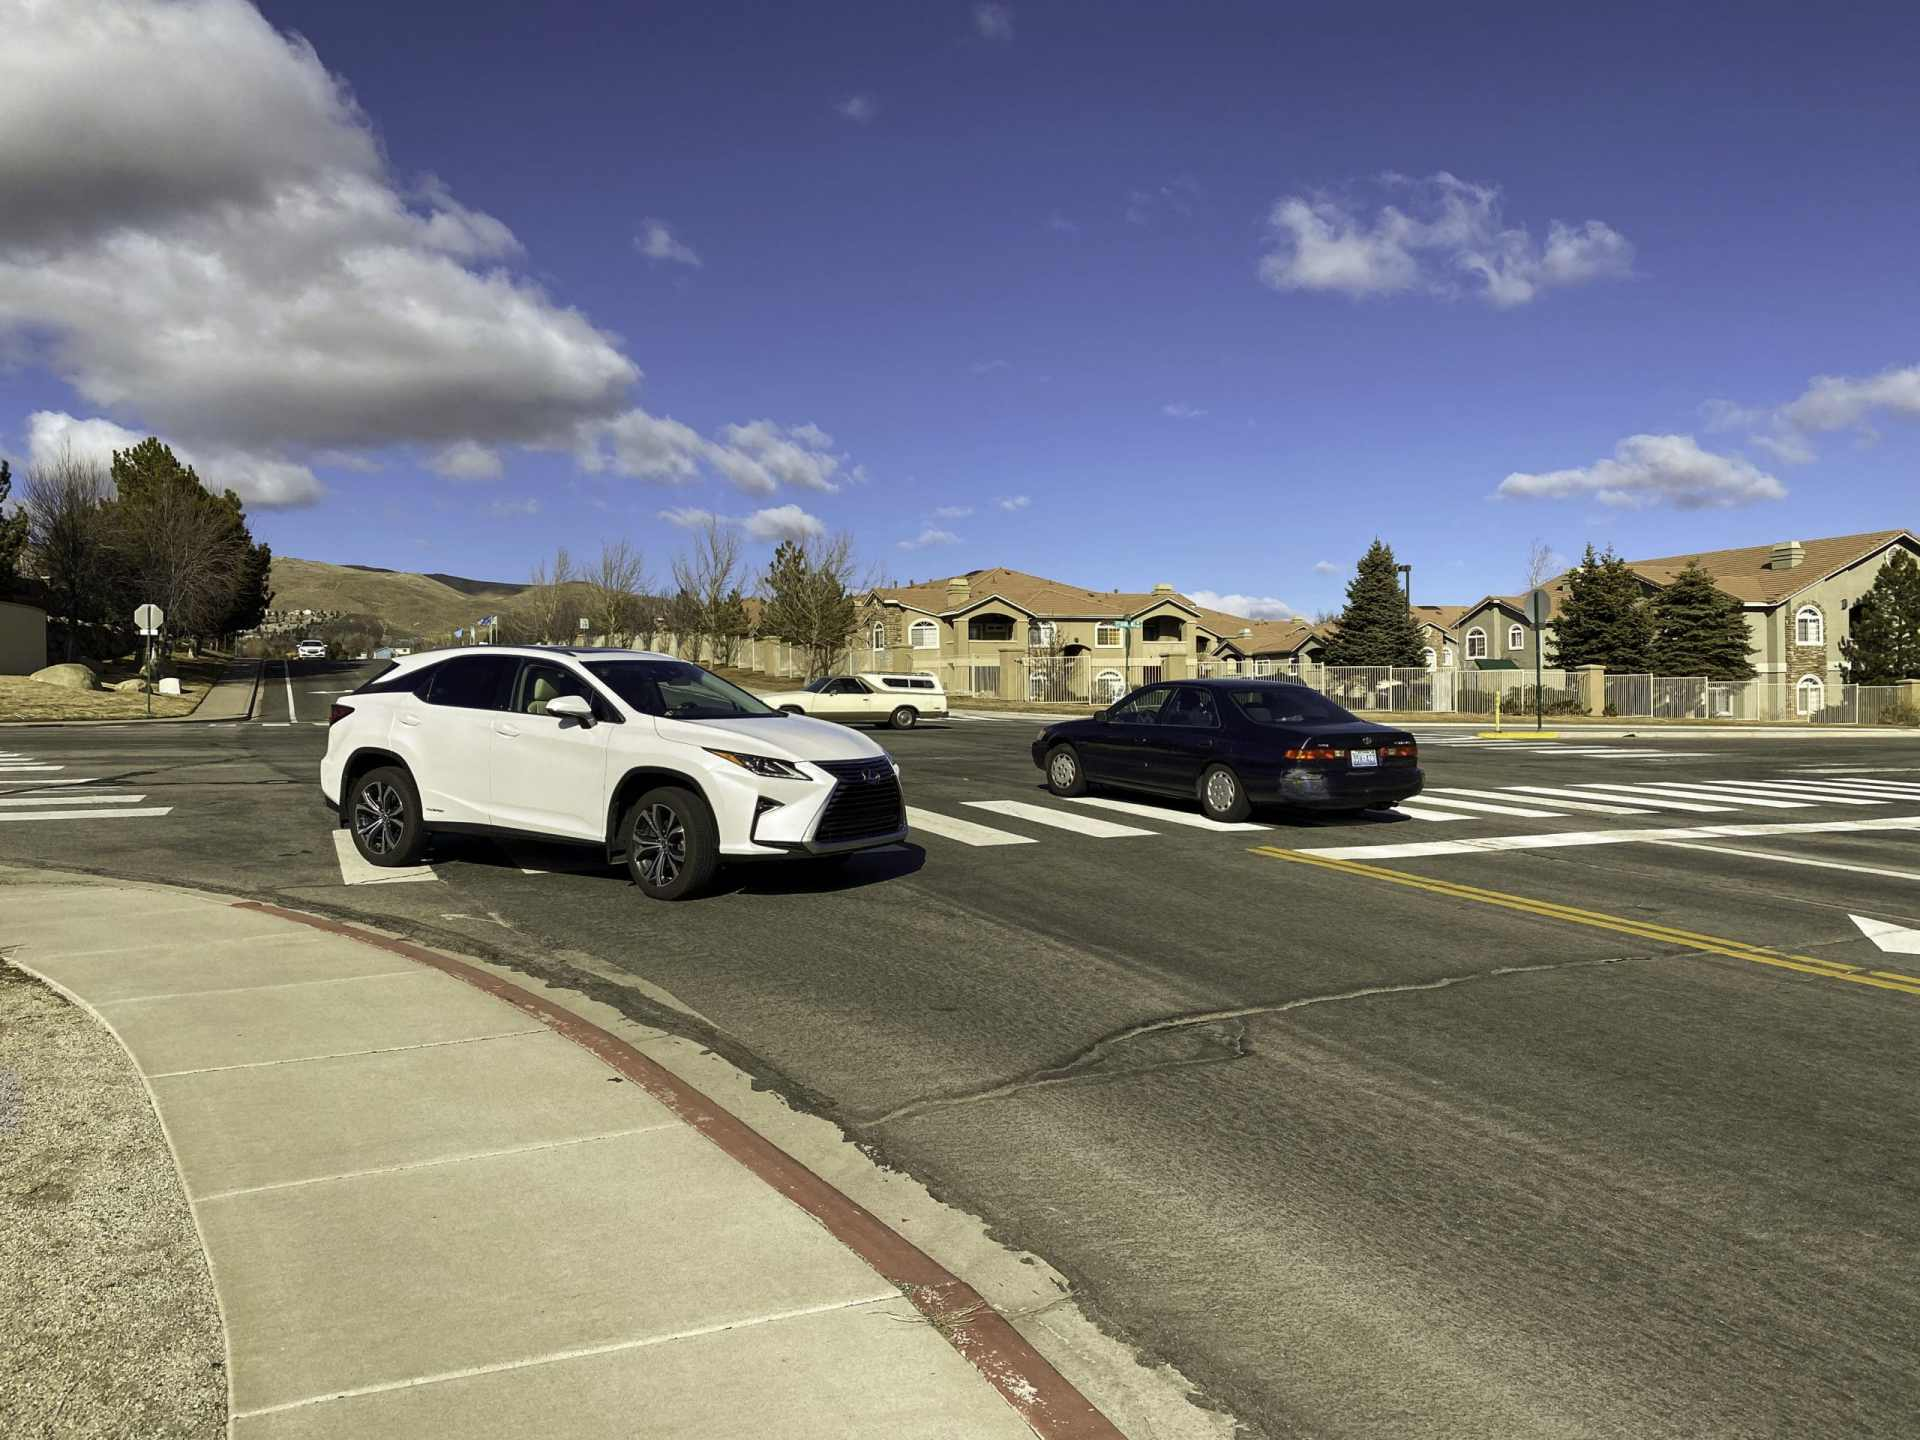 traffic cars driving